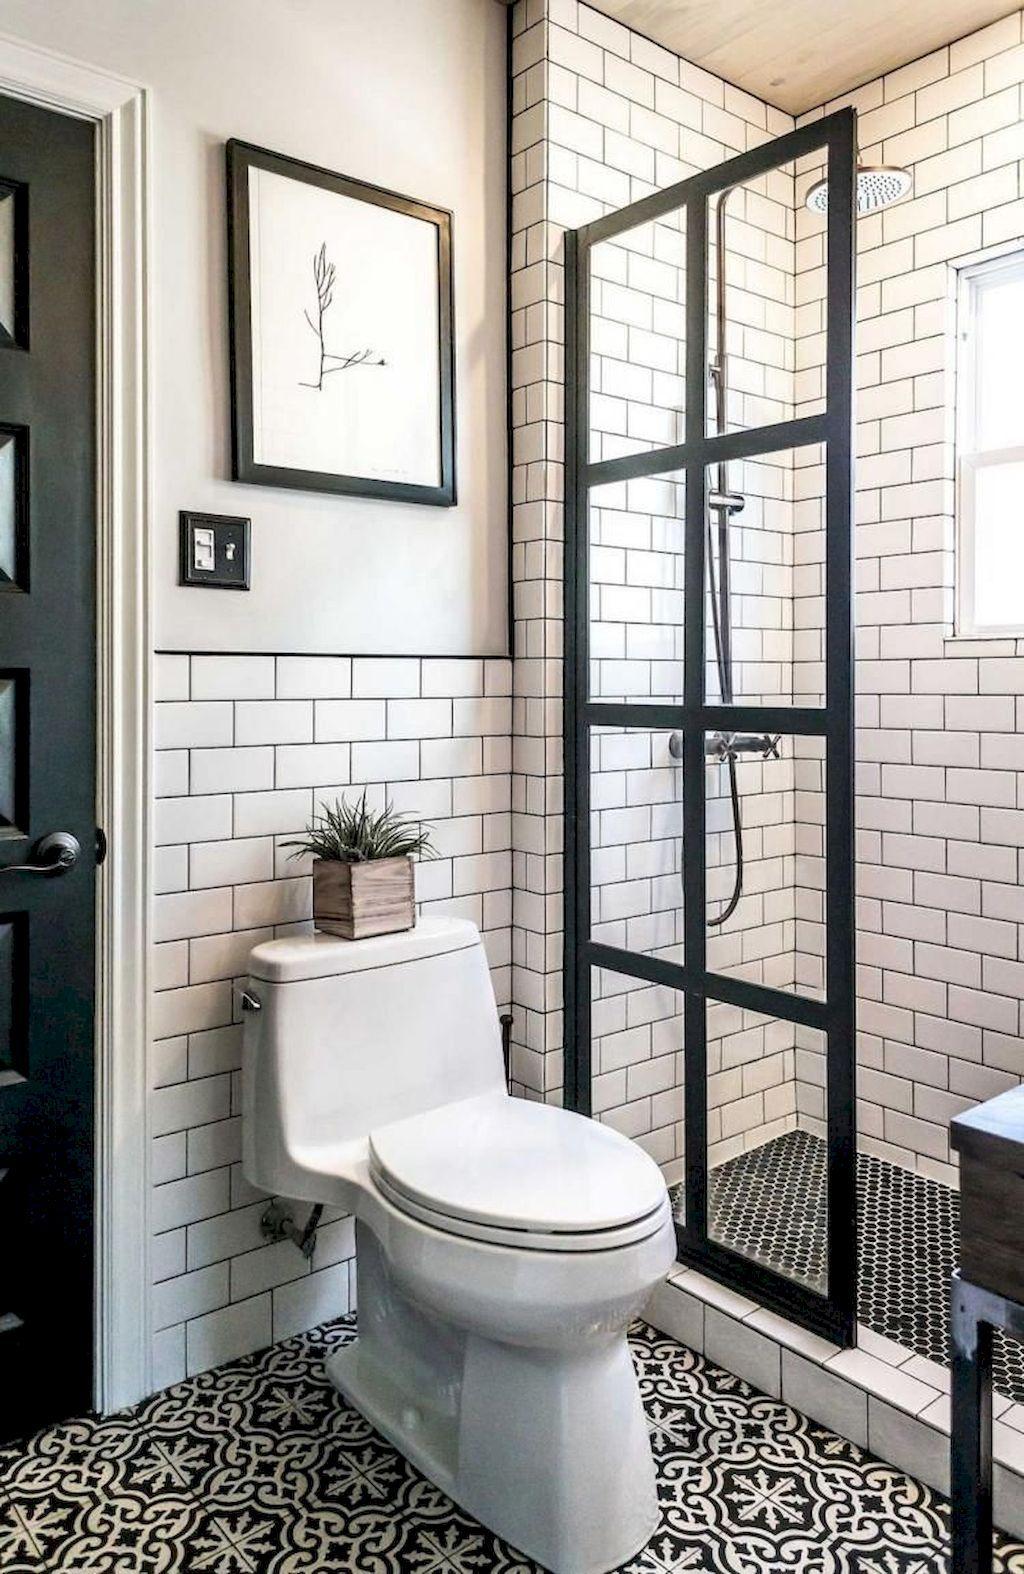 Adorable 85 Beautiful Small Bathroom Decor Ideas On A Budget Bathroom Small Bathroom Remodel Bathroom Design Small Bathroom Remodel Master